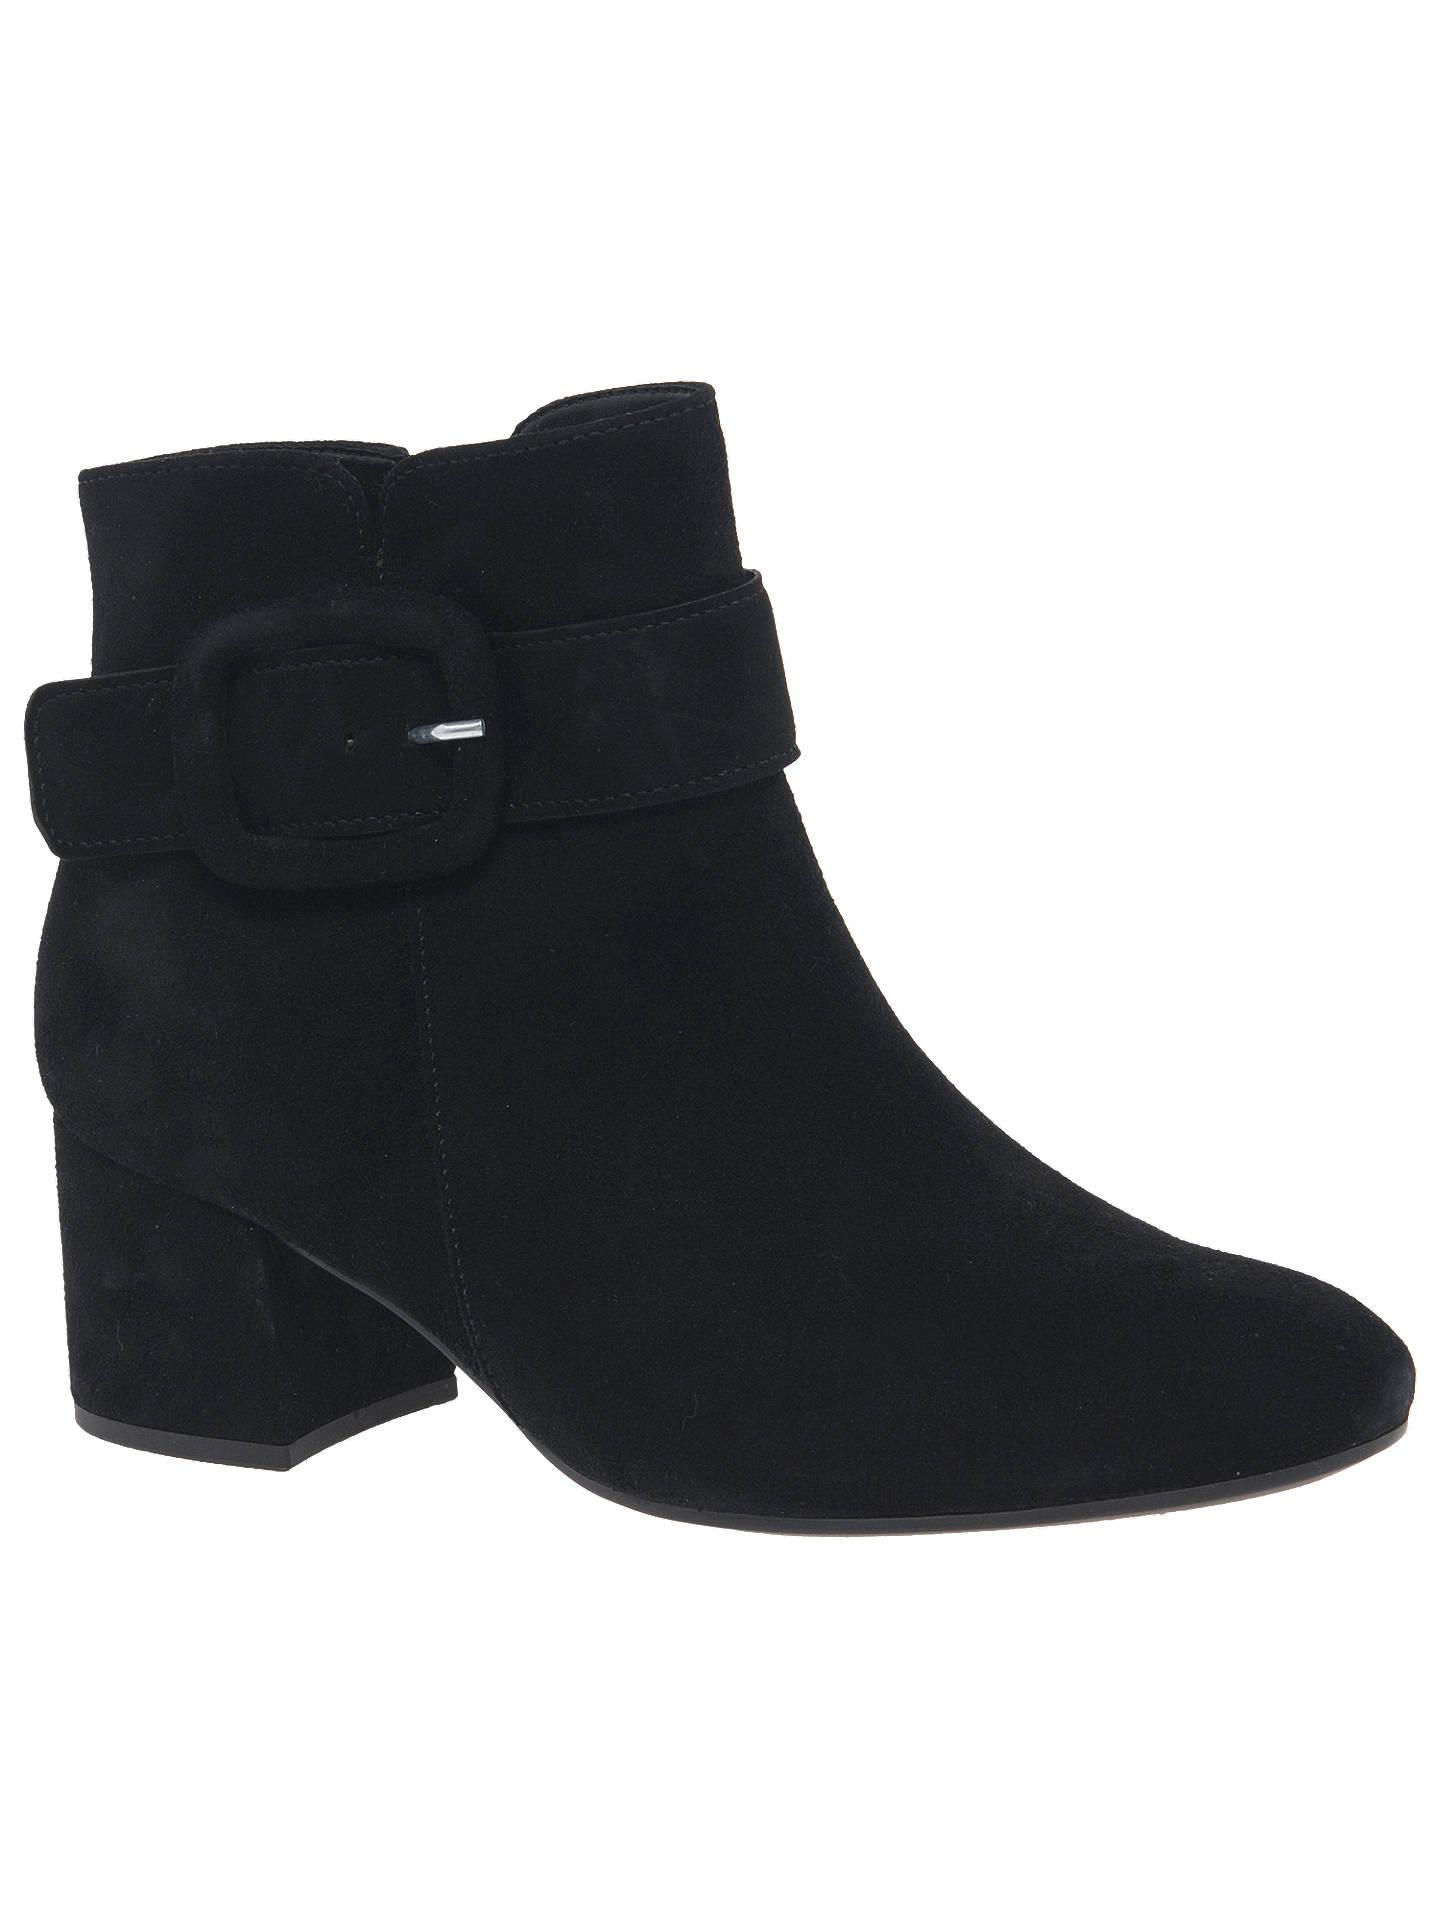 e4dac1ada Buy Gabor Capri Buckle Block Heel Ankle Boots